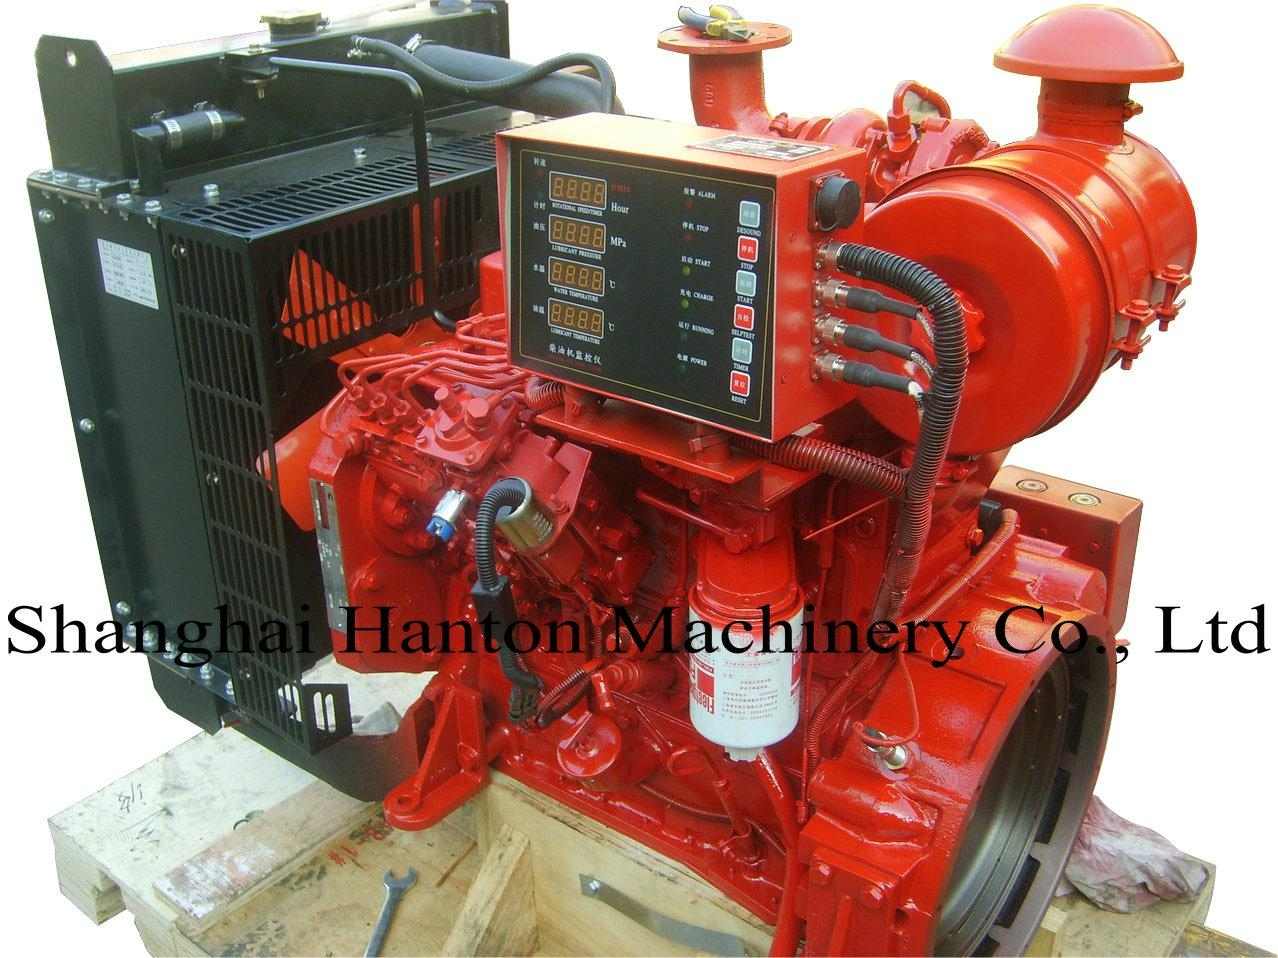 Cummins 4BTA3.9-G diesel engine for inland generator set stationary 1